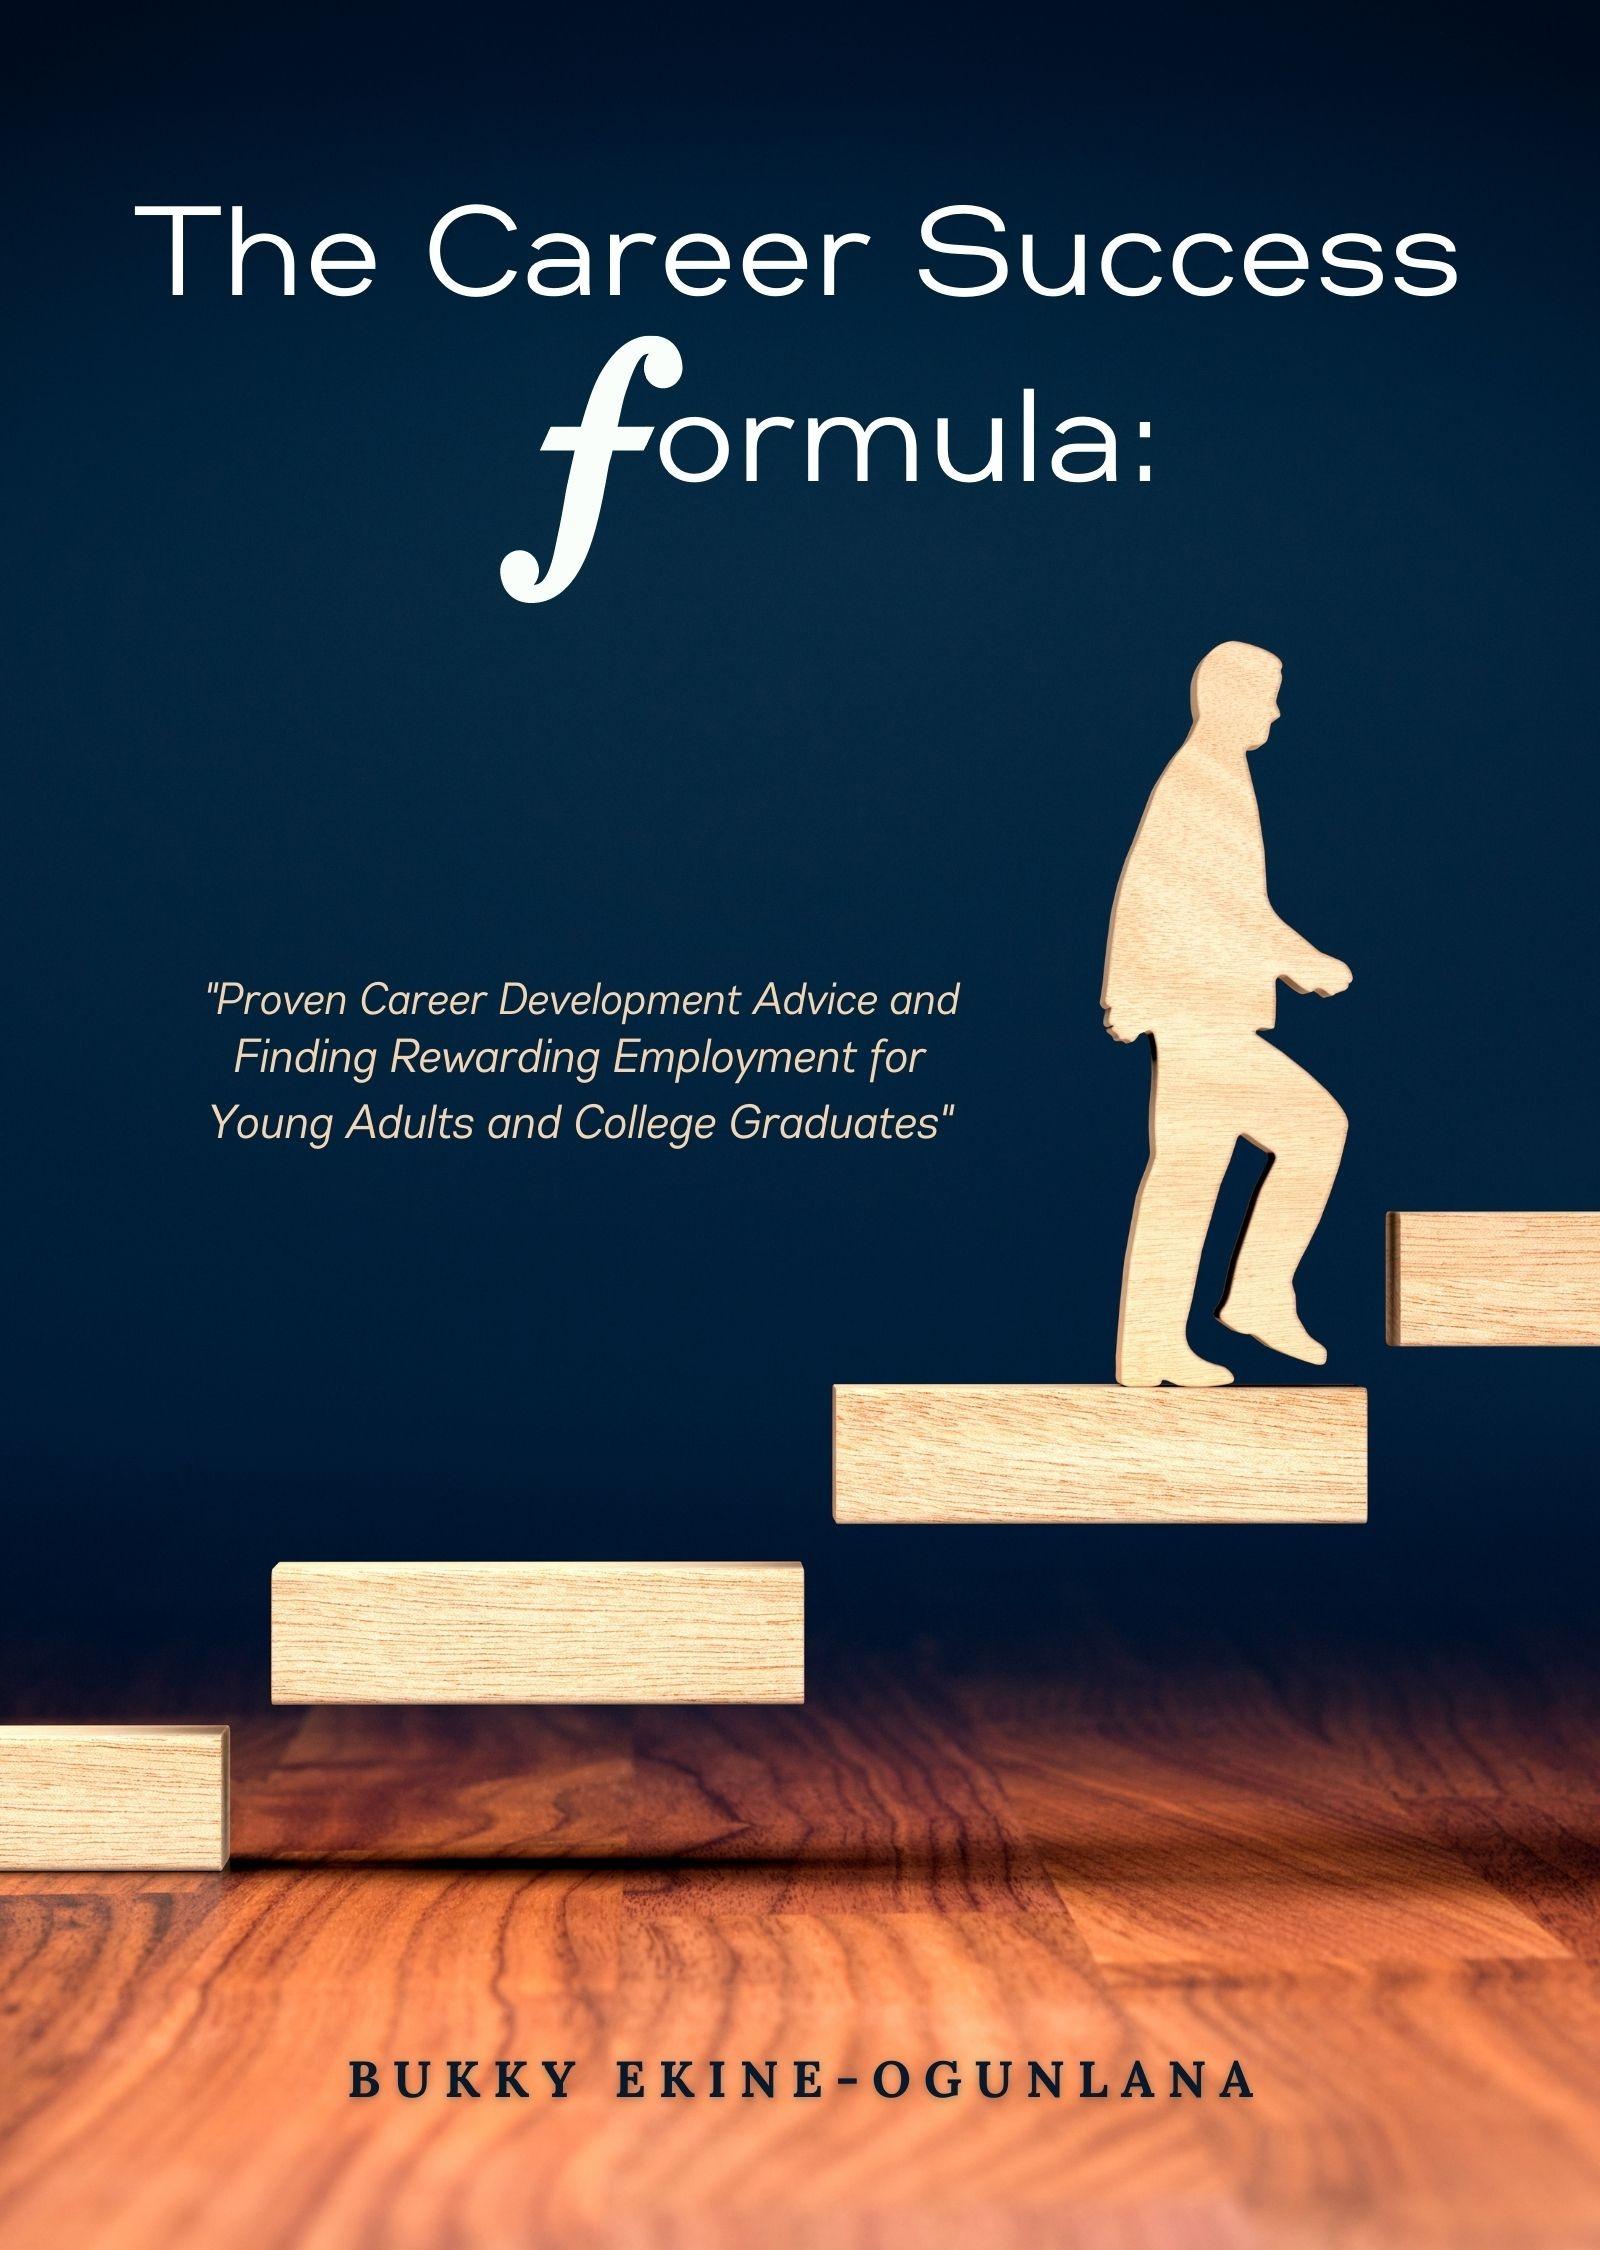 The Career Success Formula: Proven Career Development Advice and